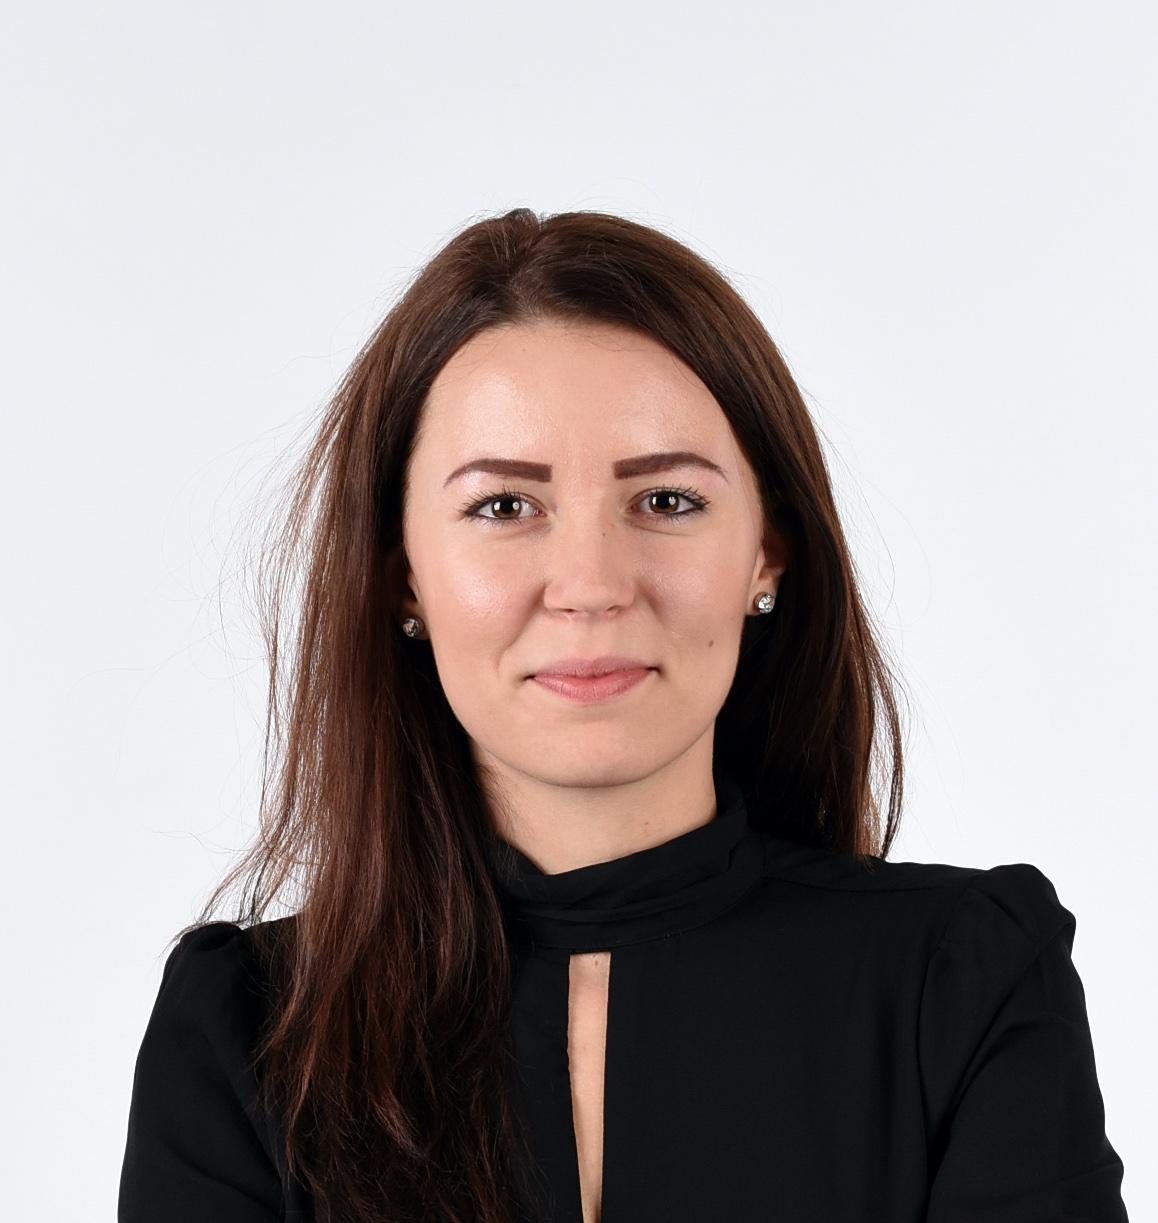 Lucie Svoboda